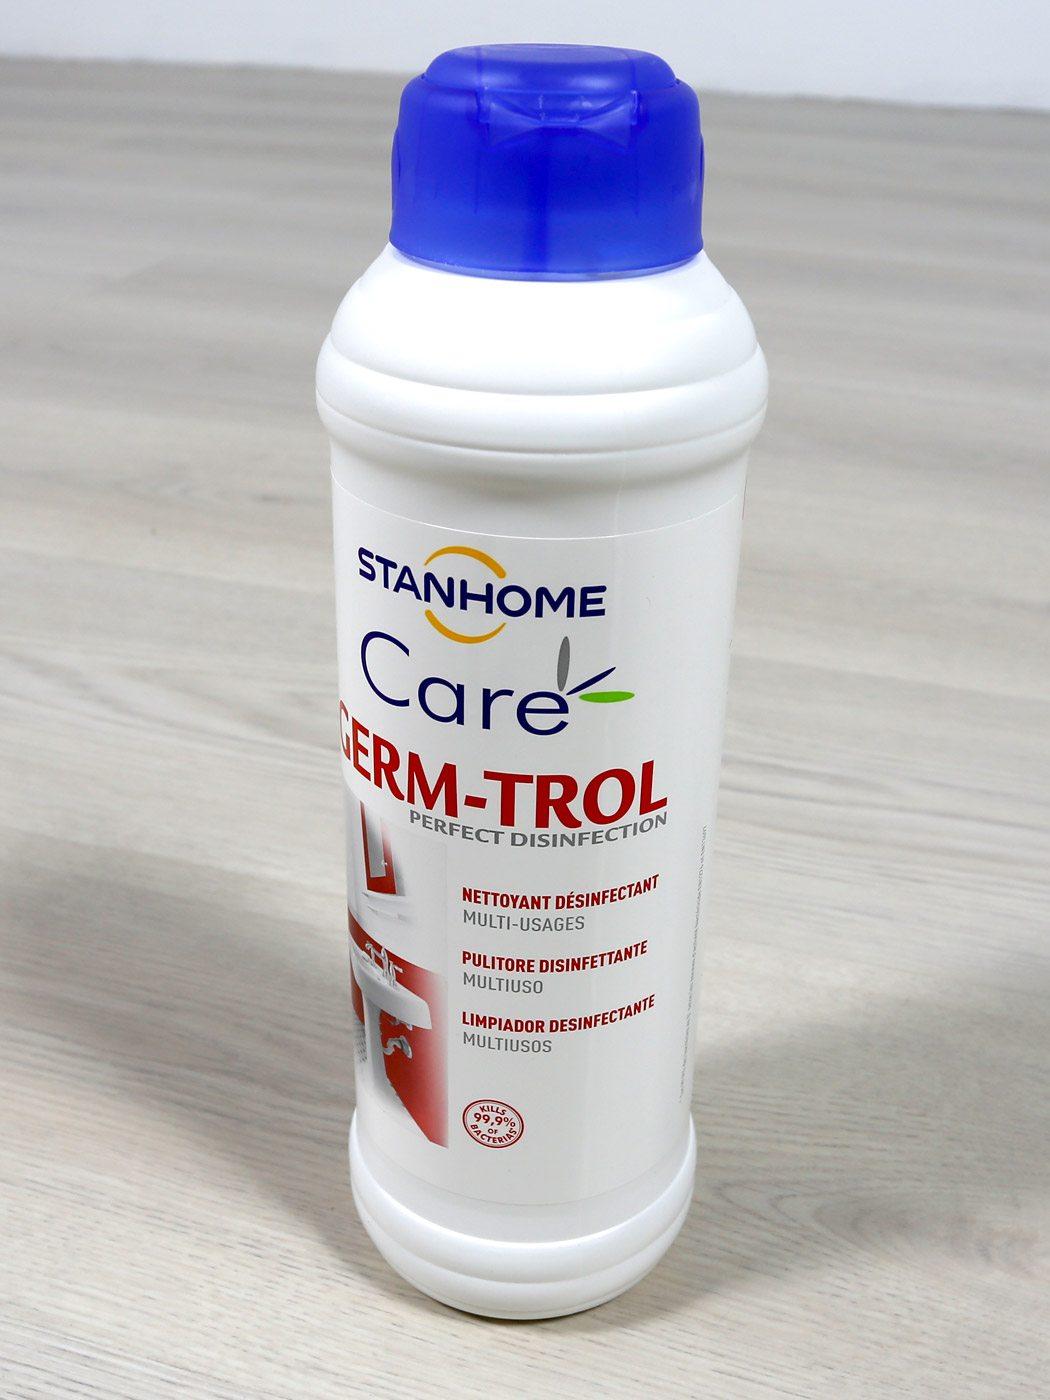 Liquido Desinfectante Multi Usos Germ Trol Viricida - Botella 1 Litro -